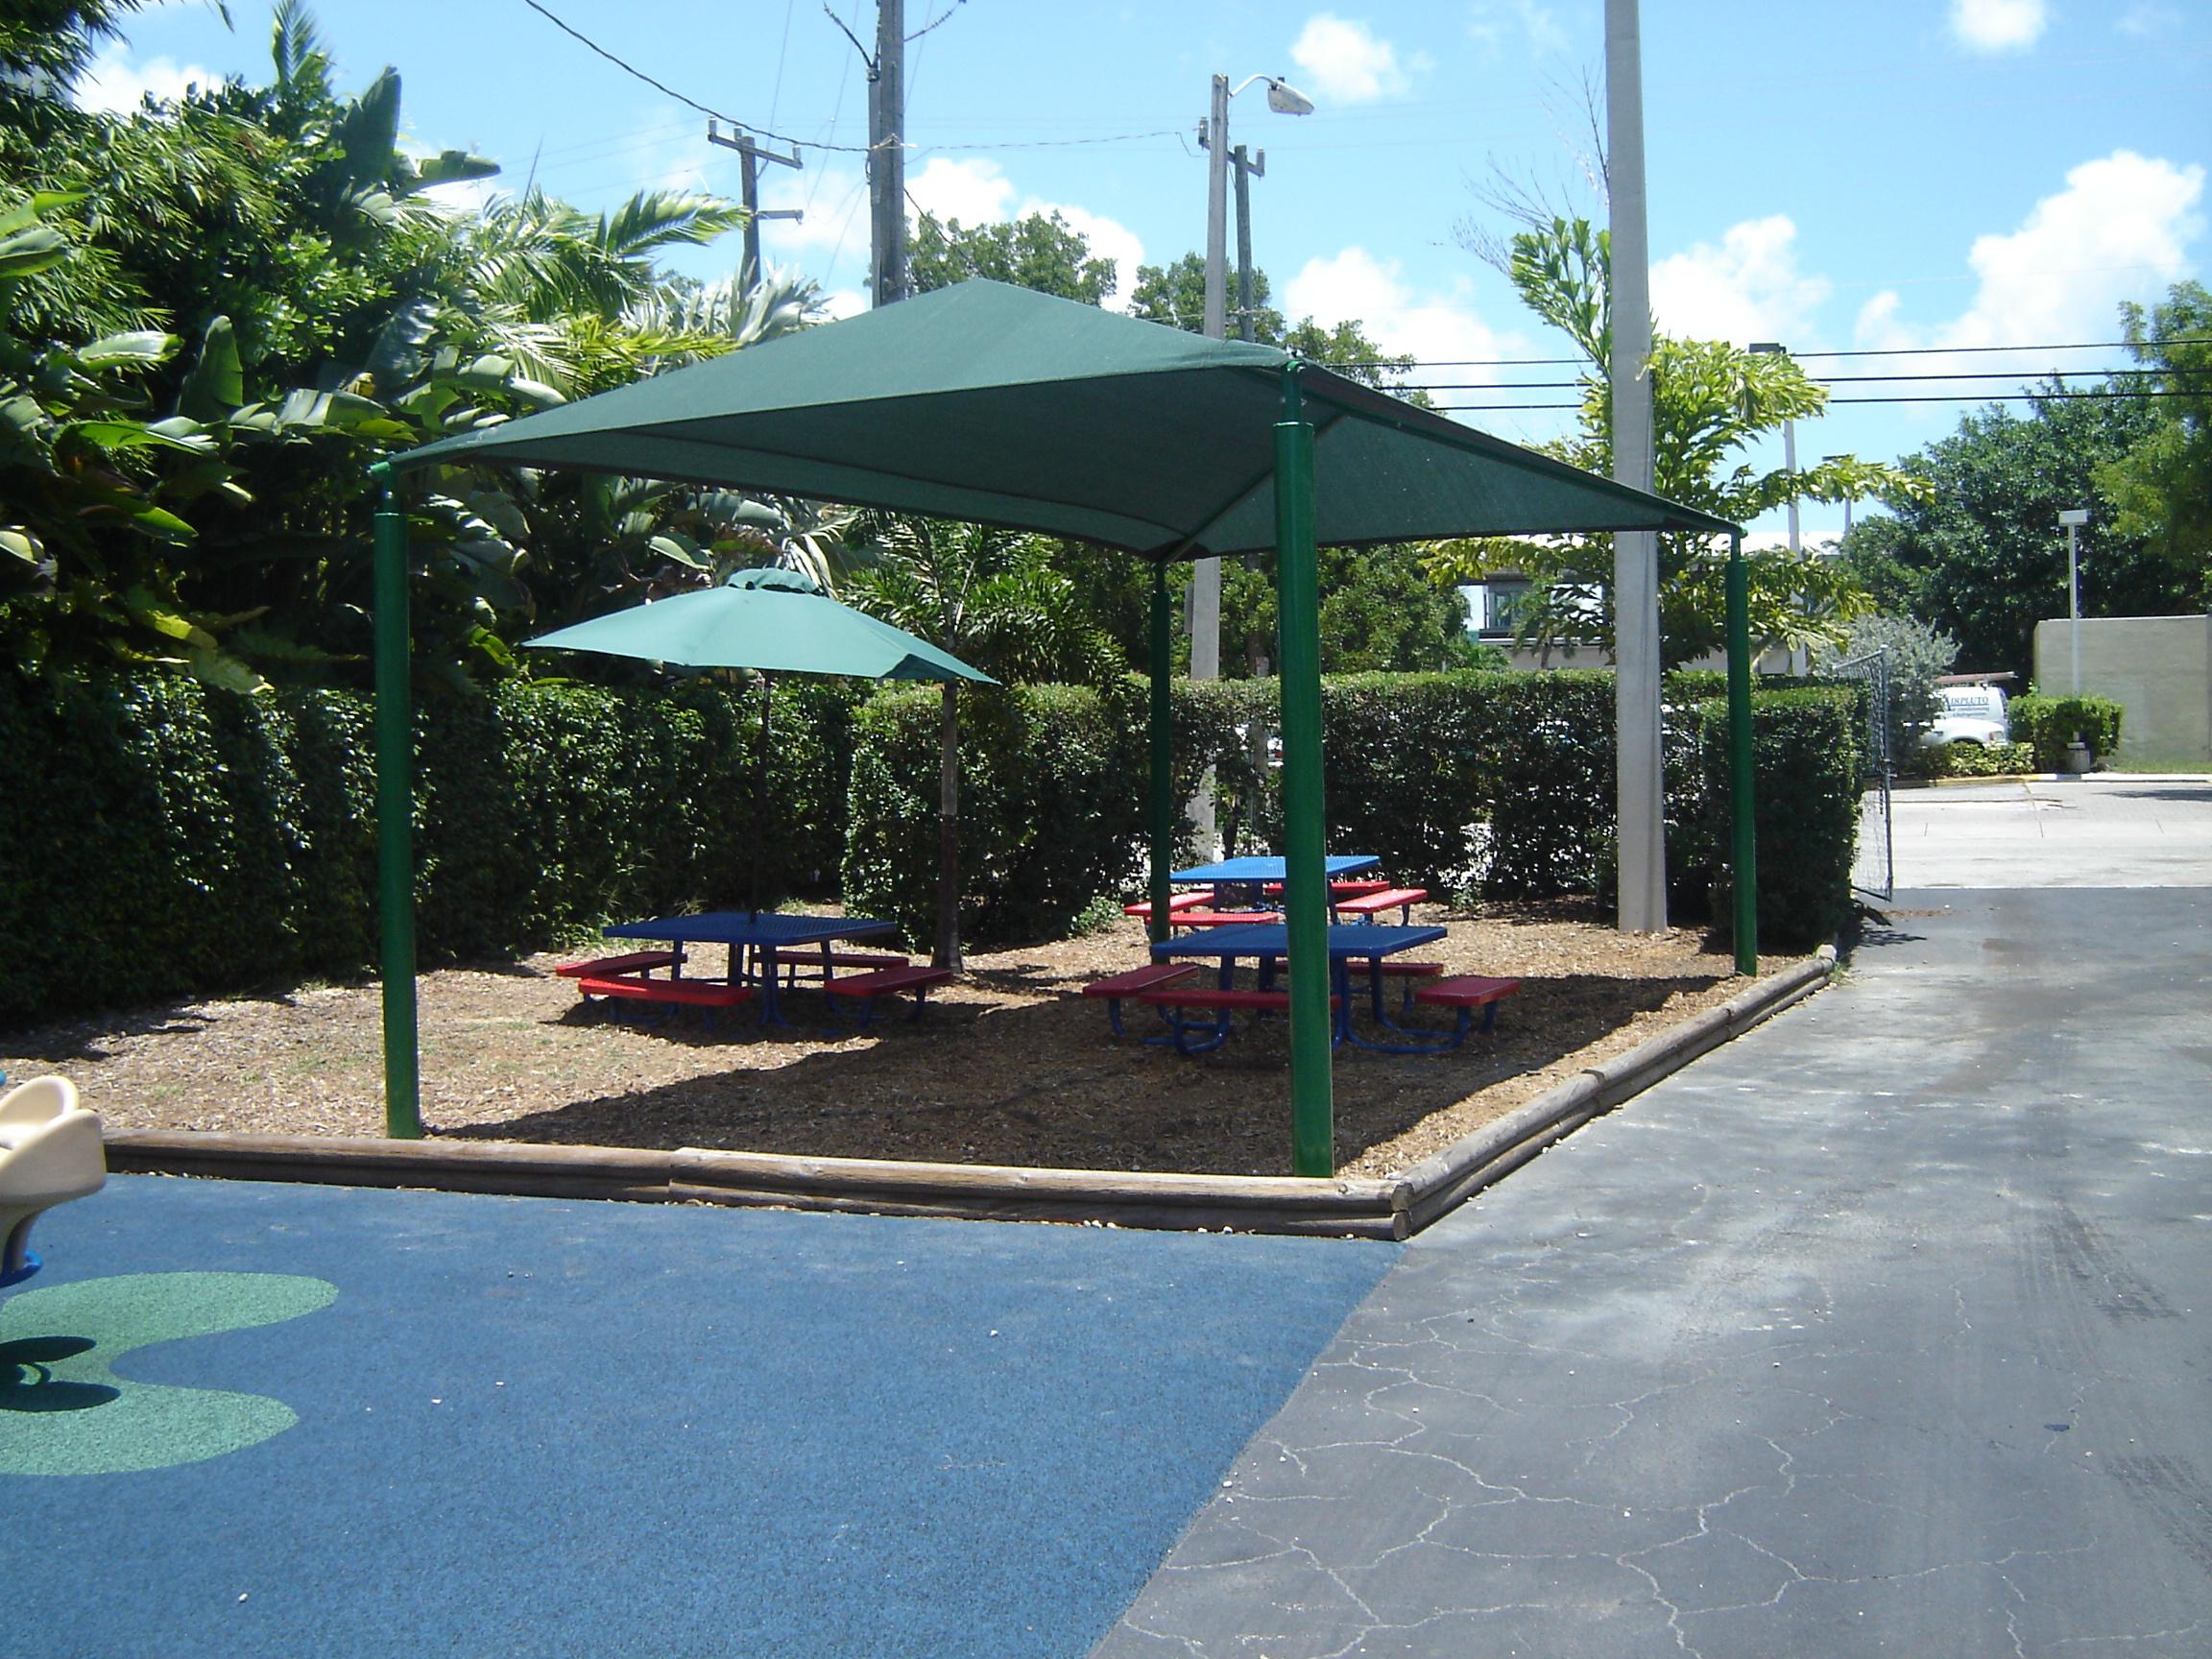 Shadeports- Coastal Canvas & Awnings - Fort Myers, Naples, SWFL